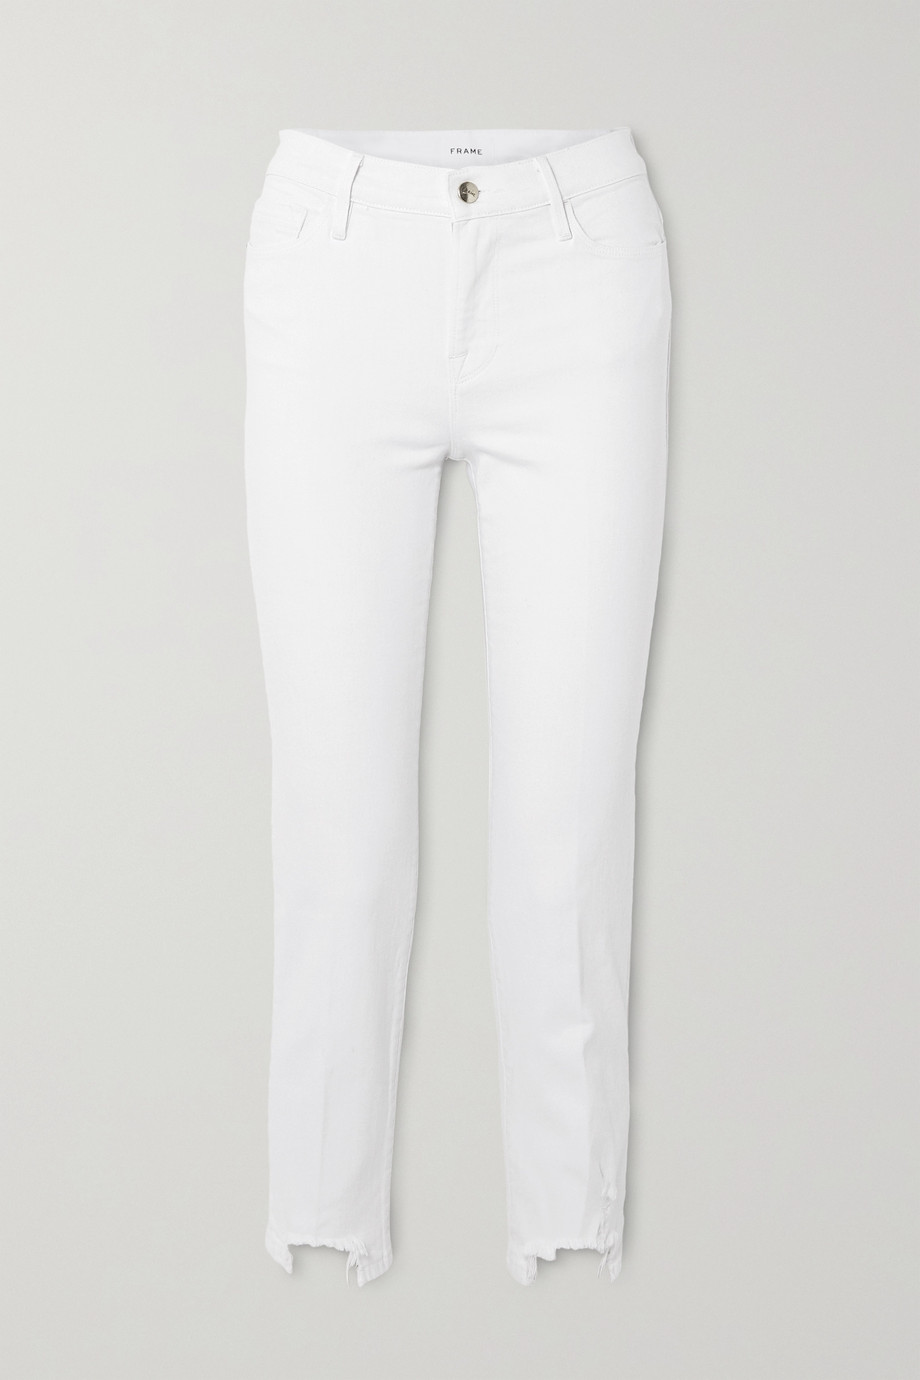 FRAME Le Nouveau cropped distressed mid-rise slim-fit jeans